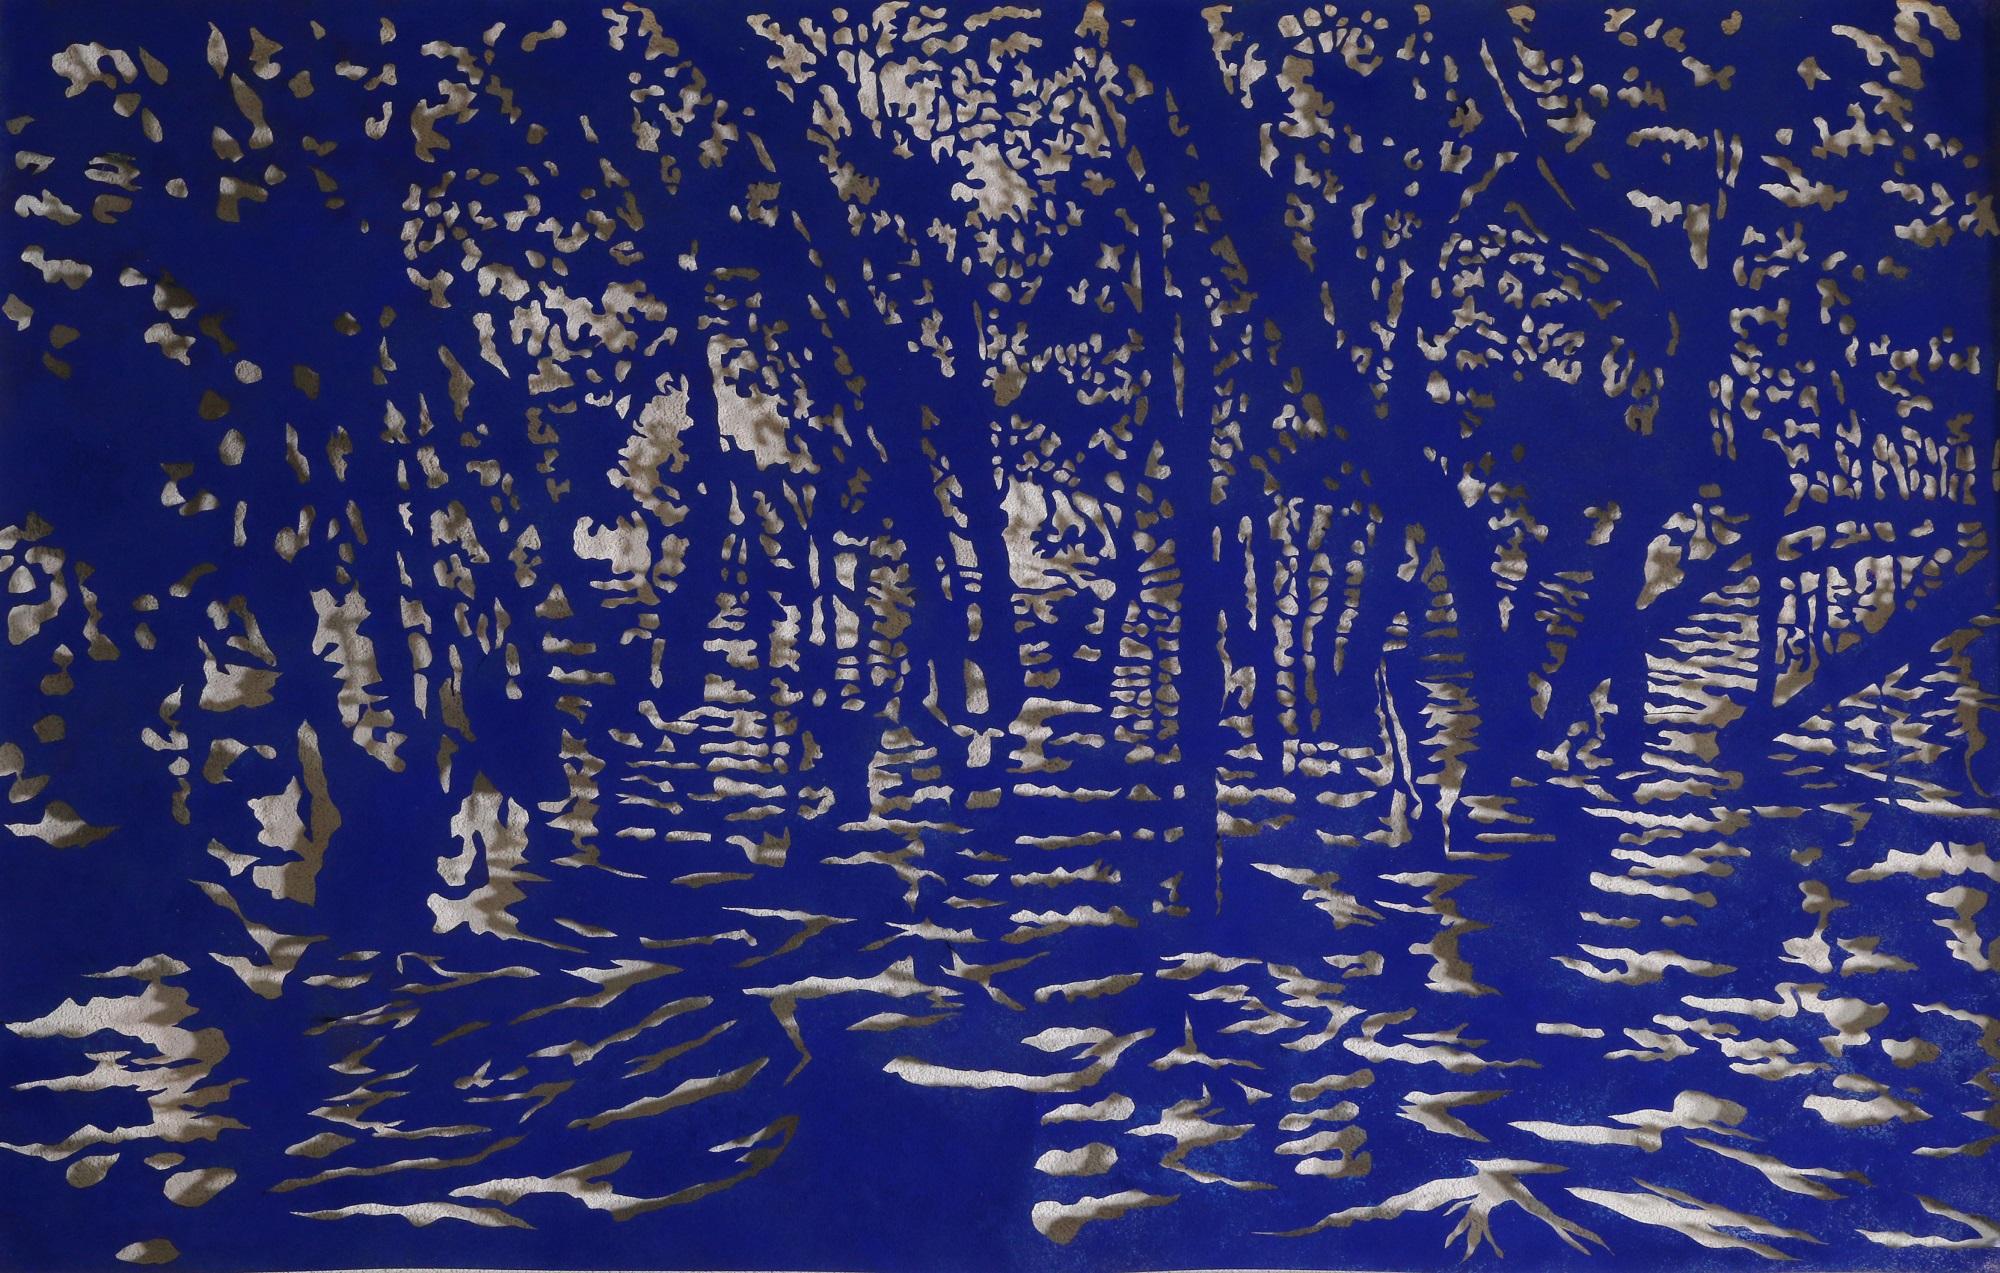 Art Atrium Andrew Tomkins Blue Cut II